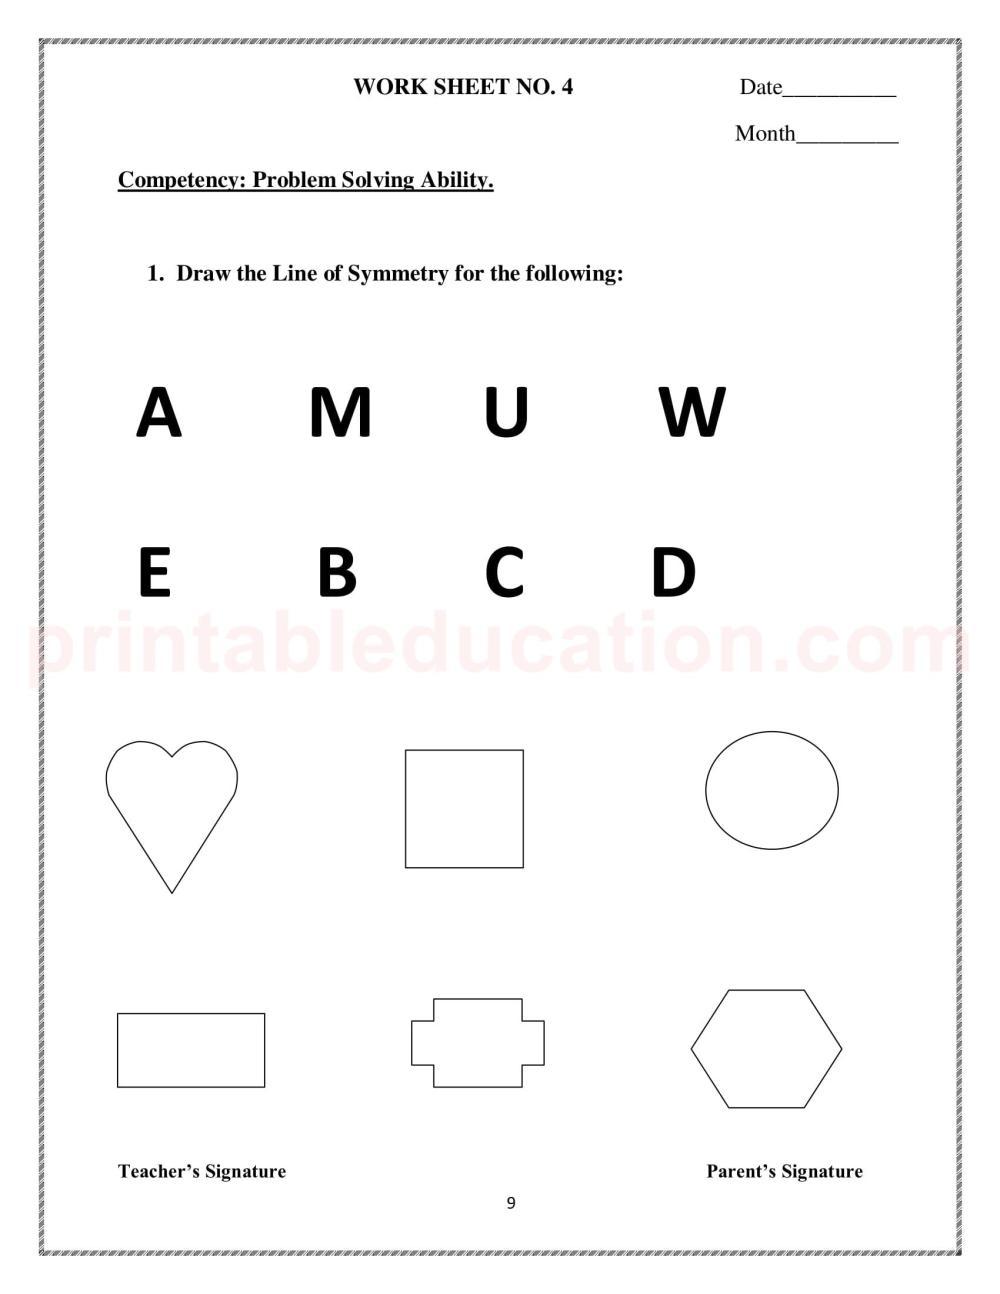 medium resolution of Symmetry Worksheet 3rd   Printable Worksheets and Activities for Teachers